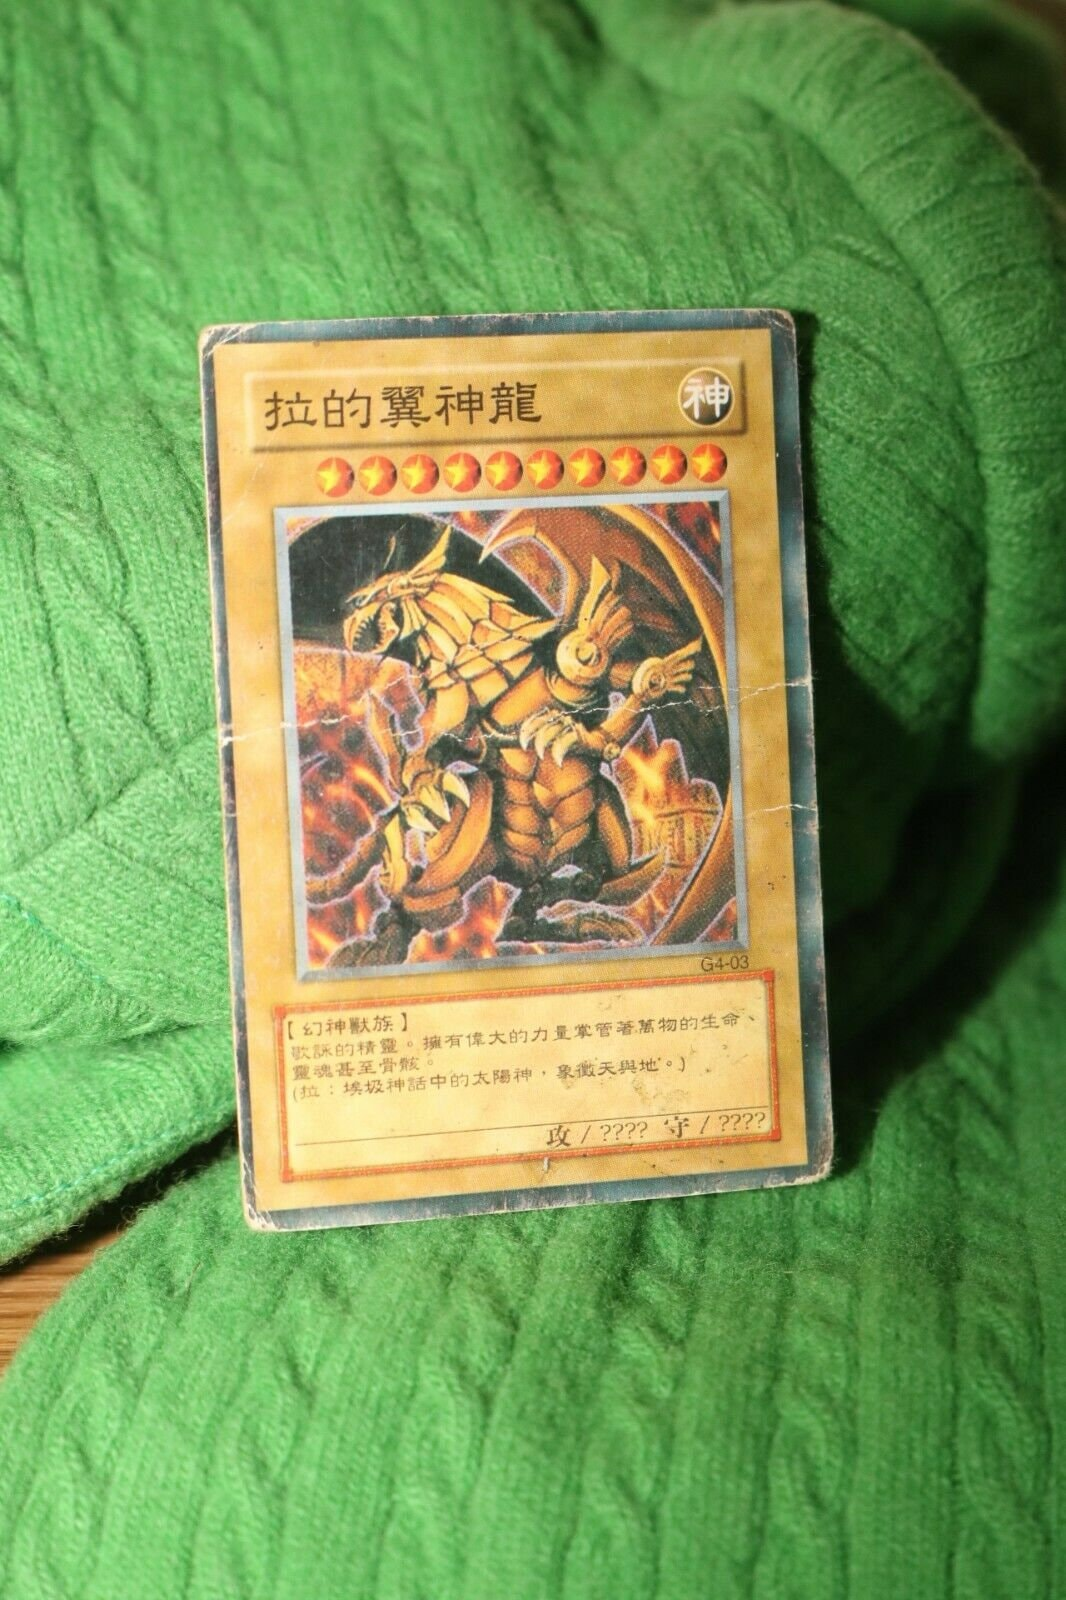 Exodia The Dark Master Yu-Gi-Oh Japanese Card LIM-000 Vintage 1990s Cards Singles YuGiOh Game